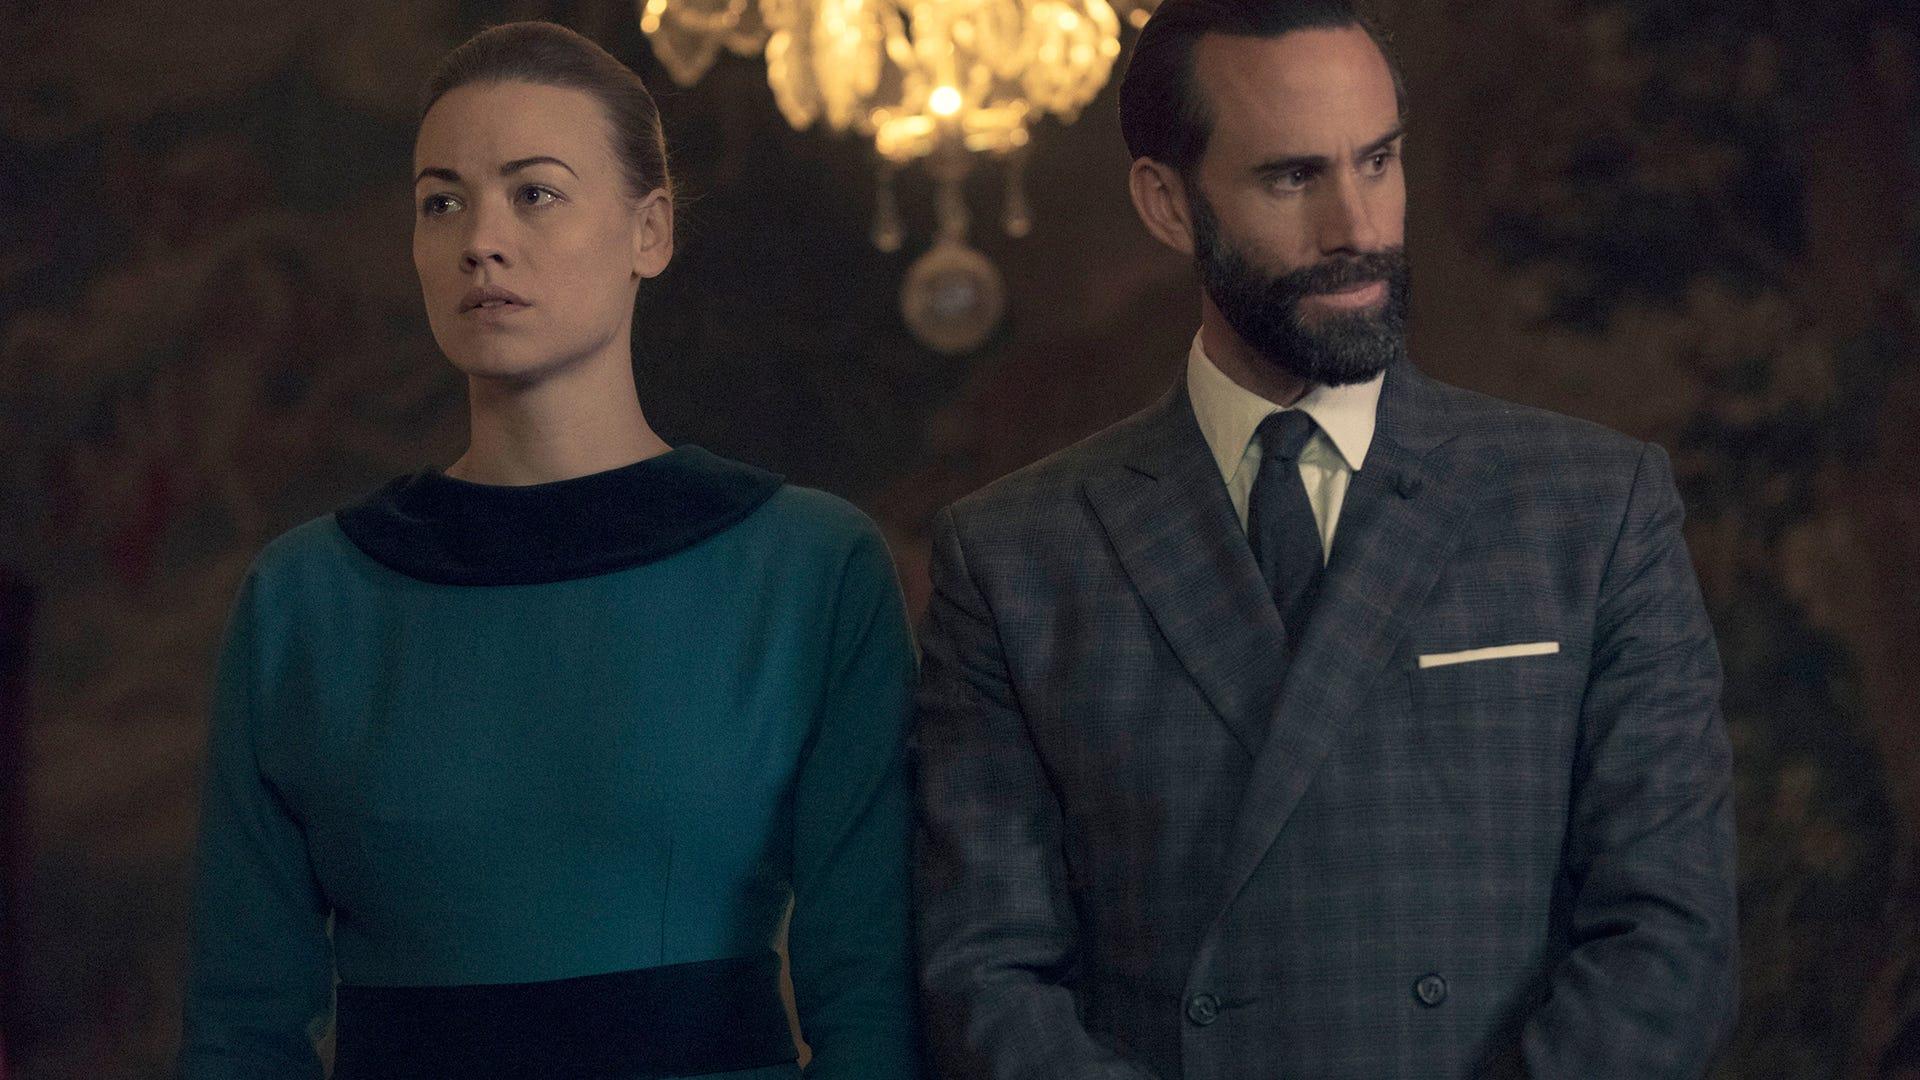 Yvonne Strahovski and Joseph Fiennes, The Handmaid's Tale